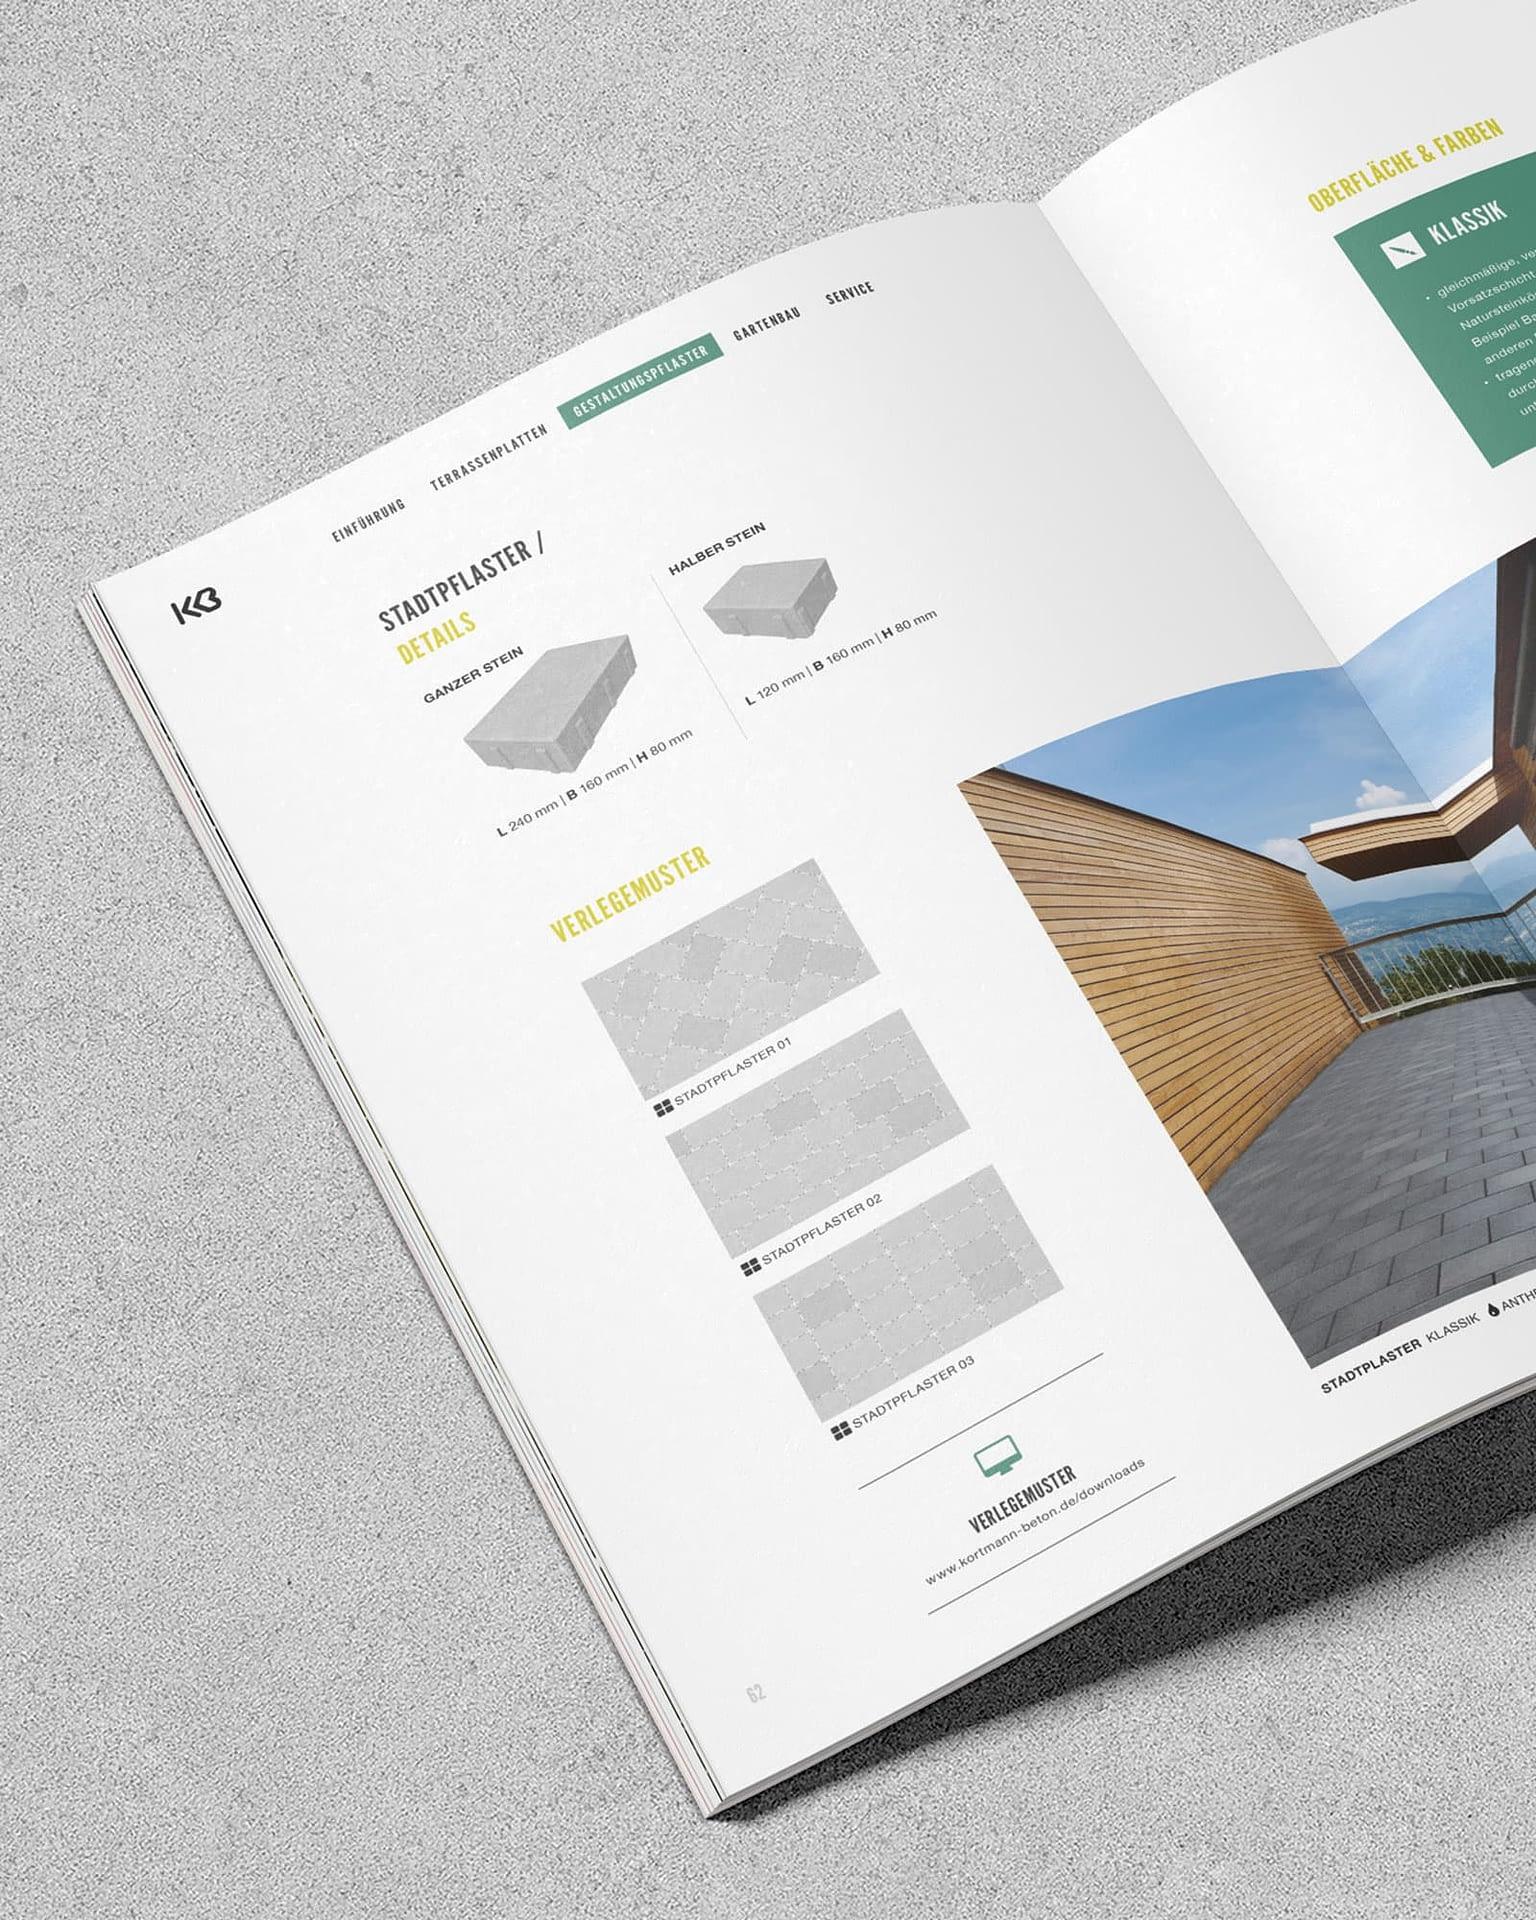 bildbearbeitung katalog für kortmann beton